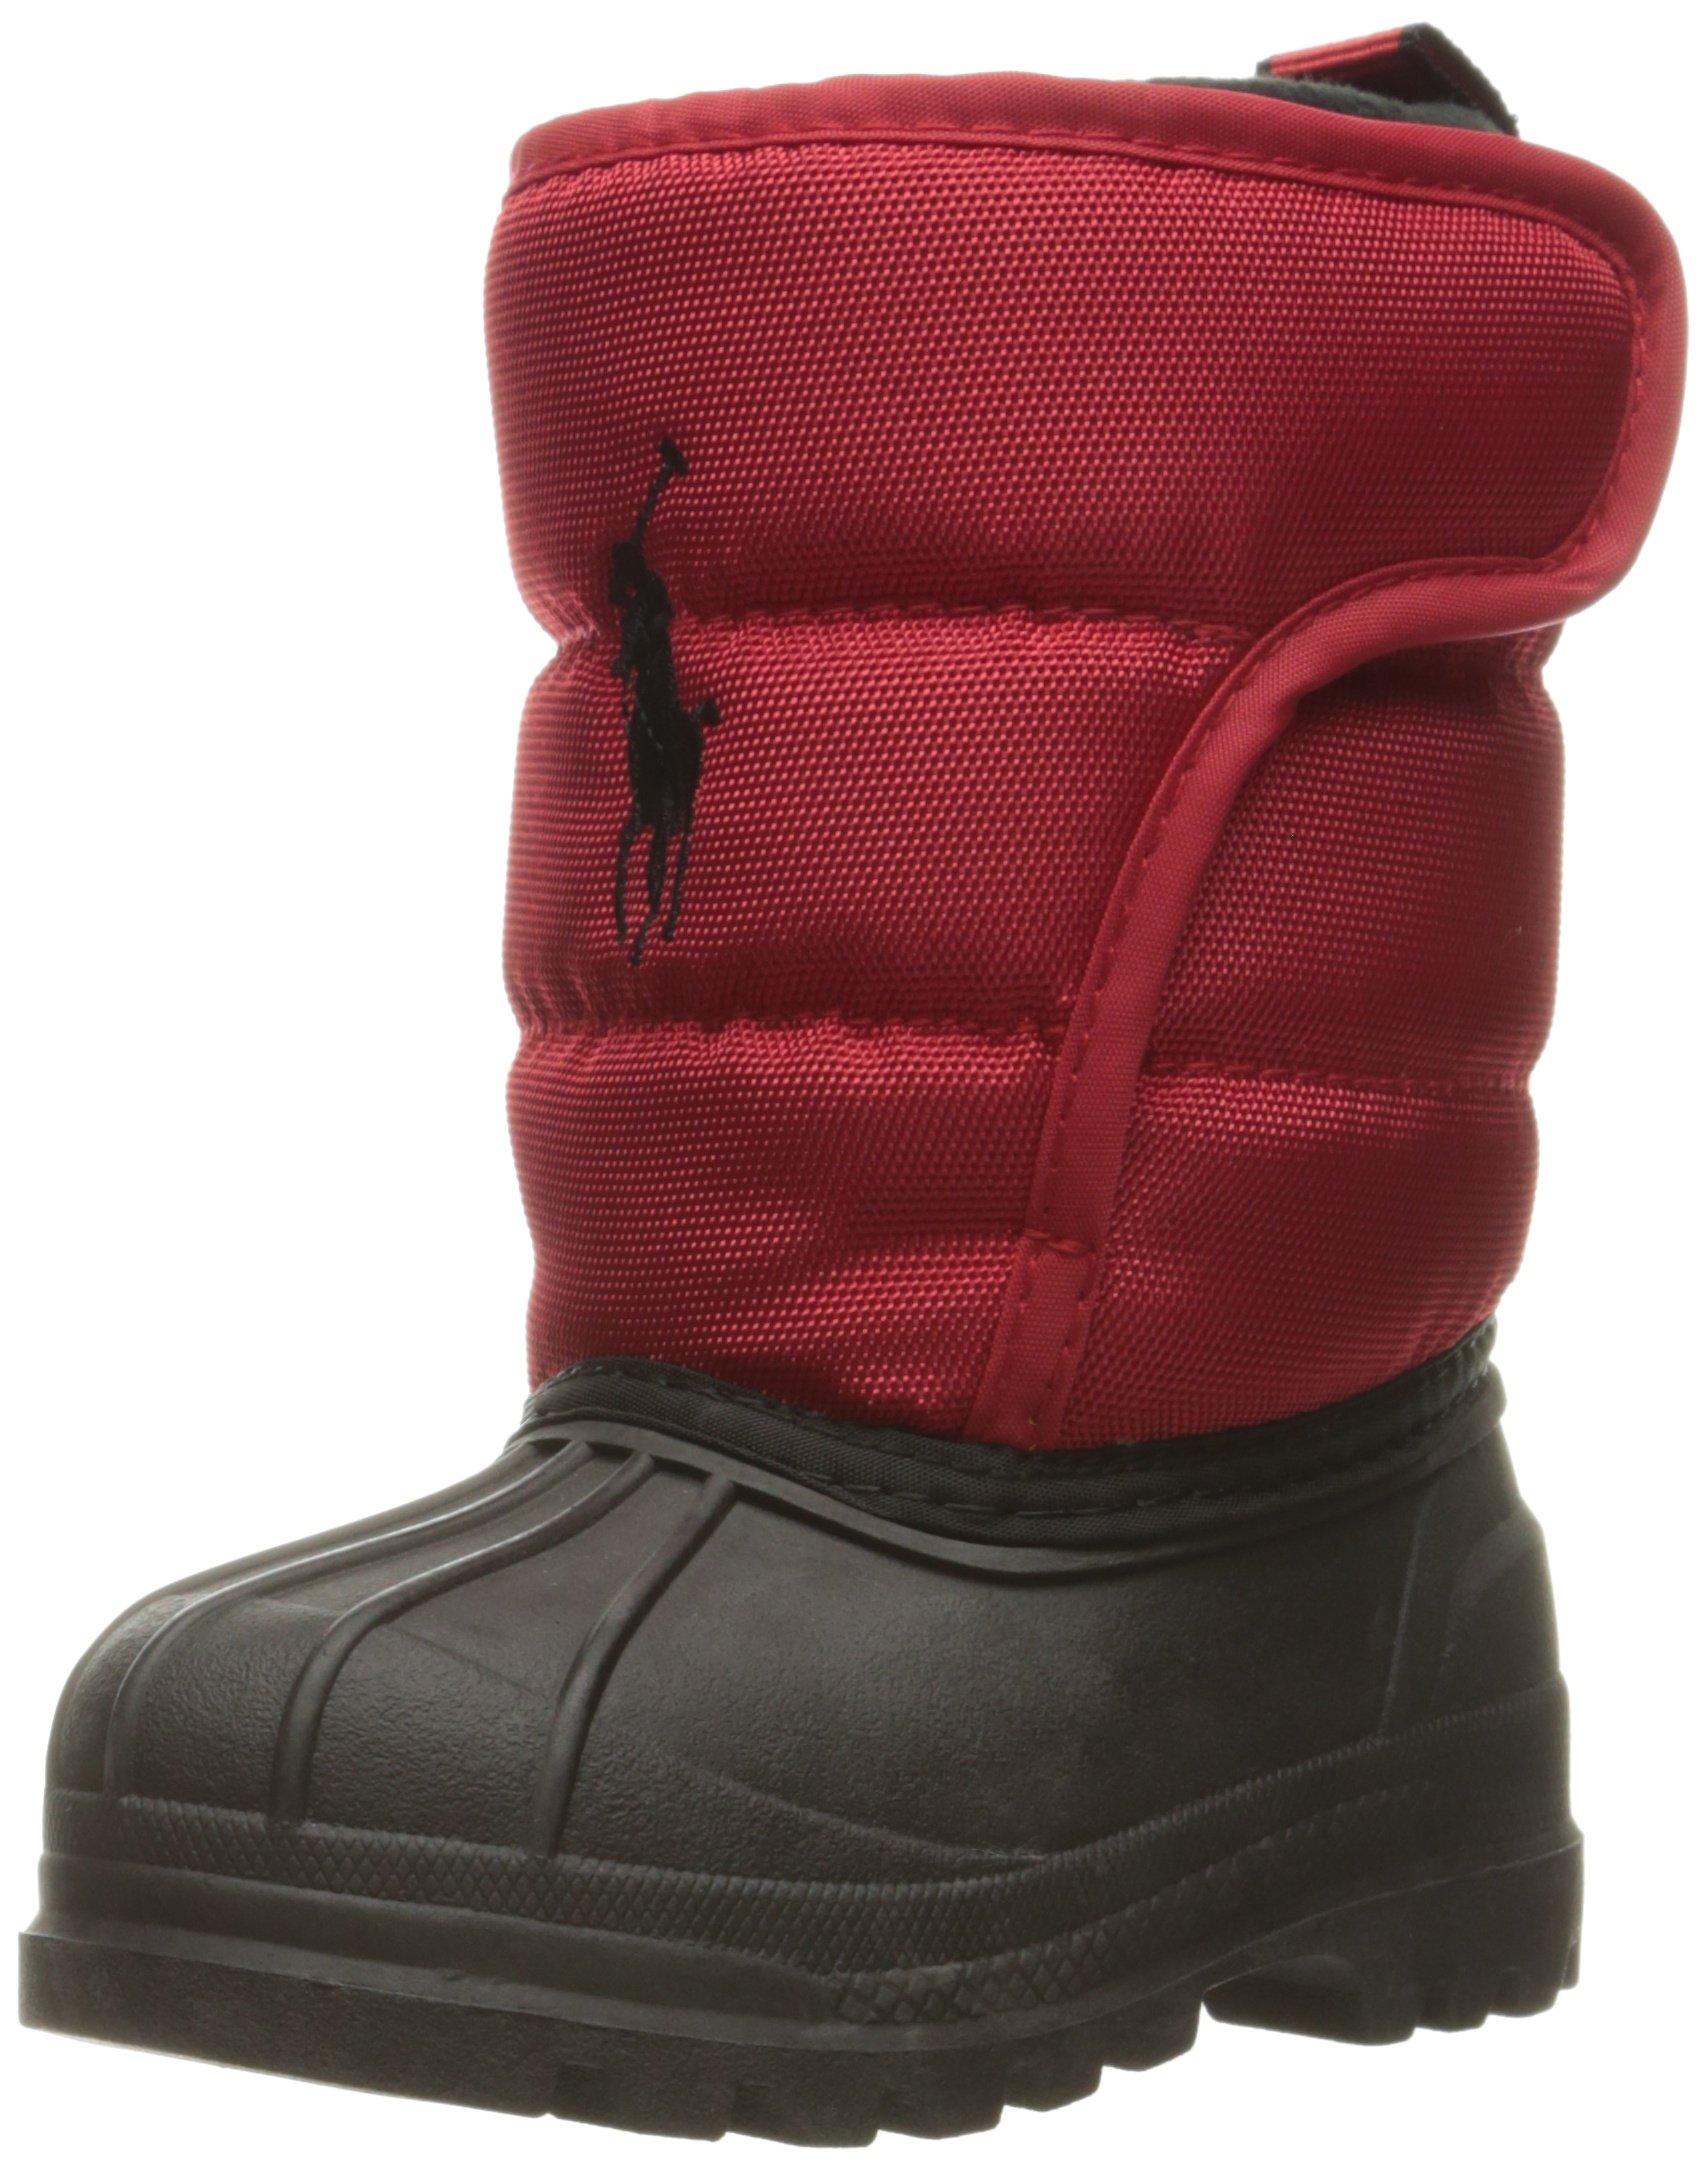 Polo Ralph Lauren Kids Kids' 993533 Snow Boot Red 10 M US Toddler